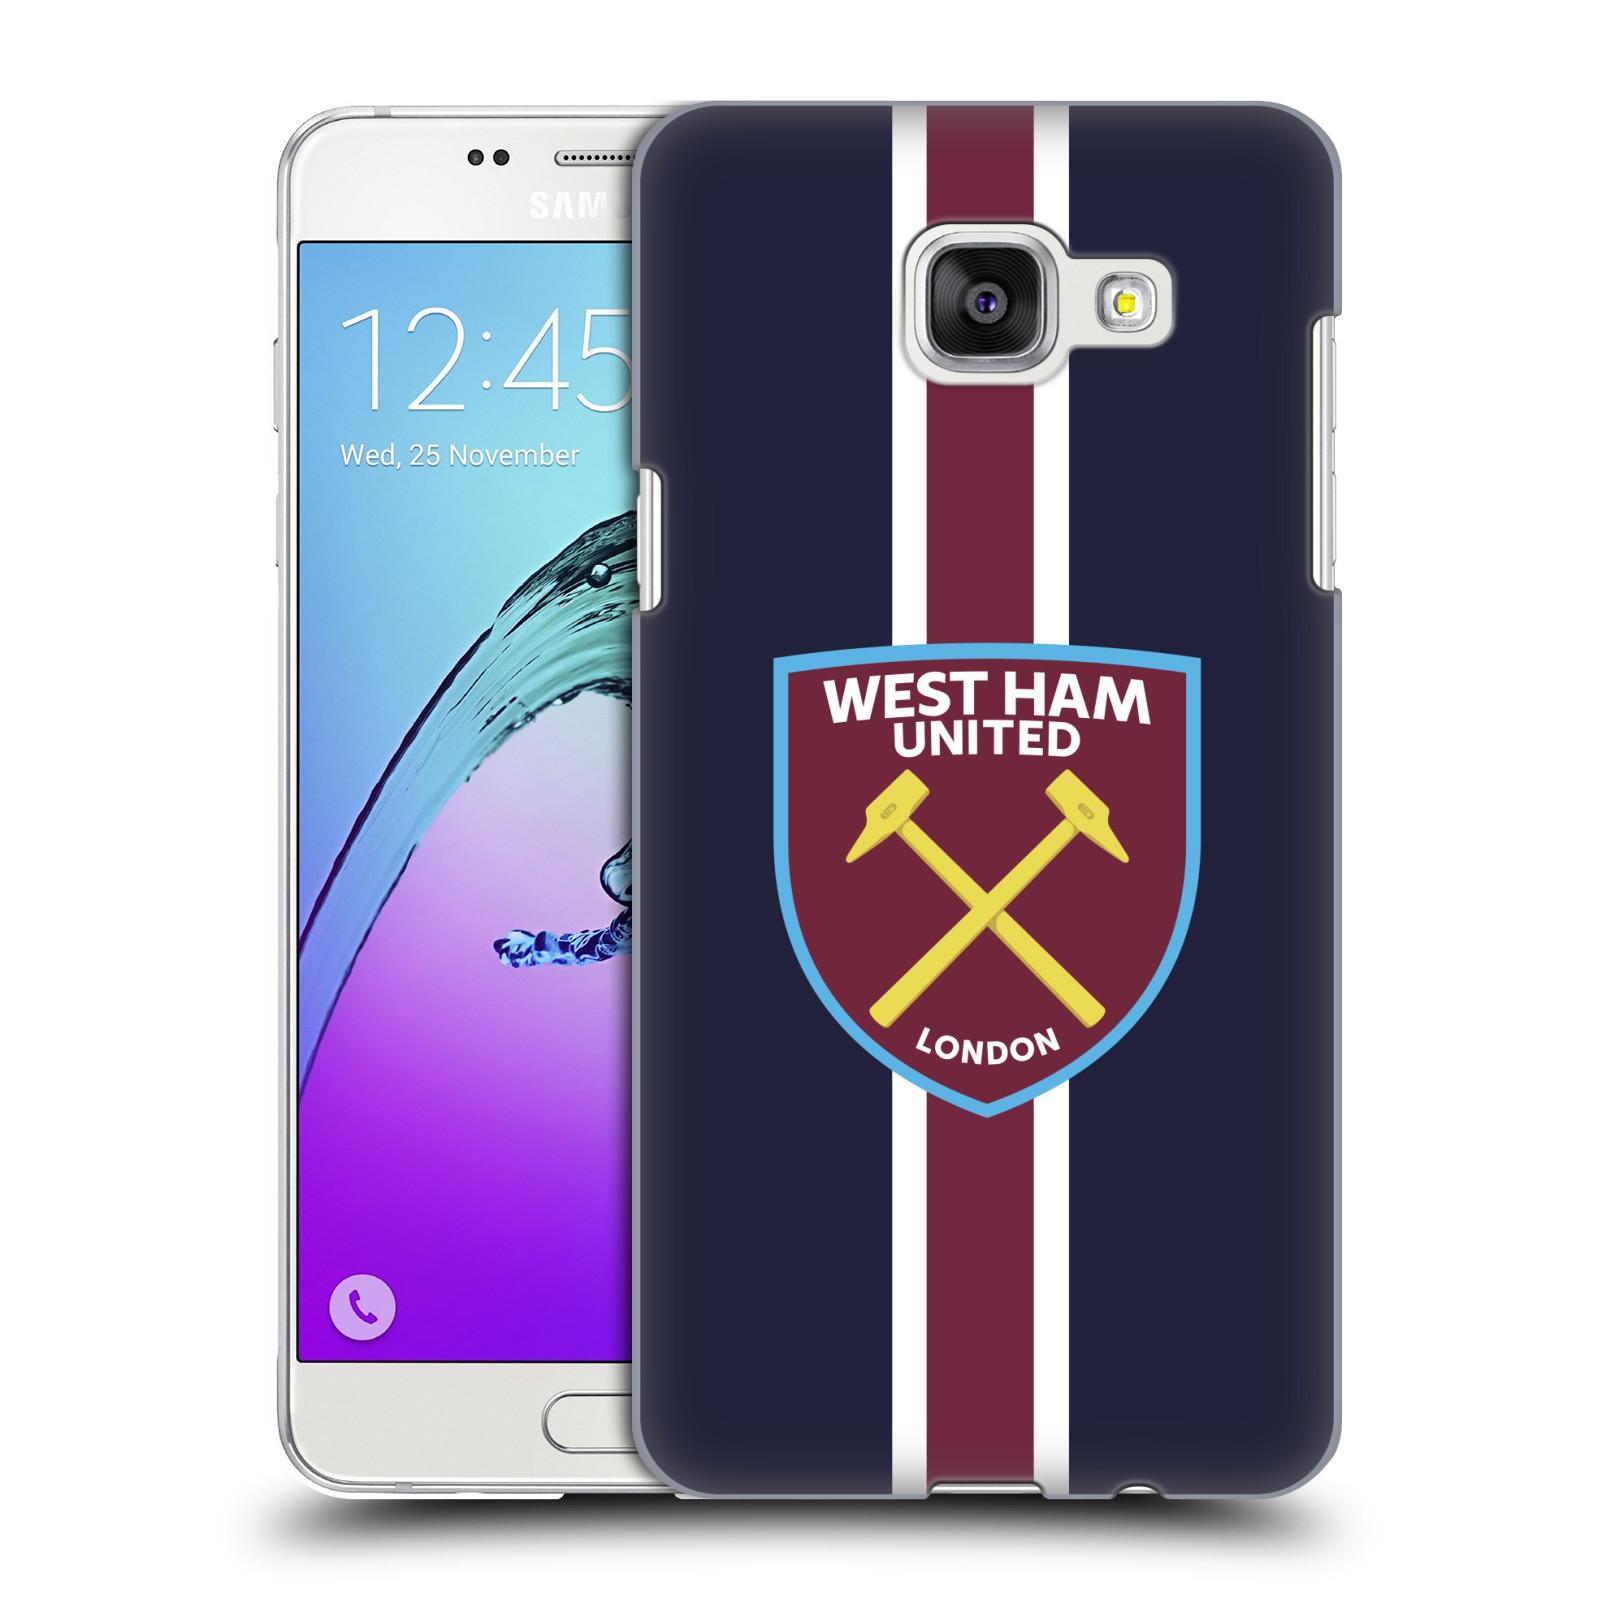 Plastové pouzdro na mobil Samsung Galaxy A5 (2016) - Head Case - West Ham United - Pruhy